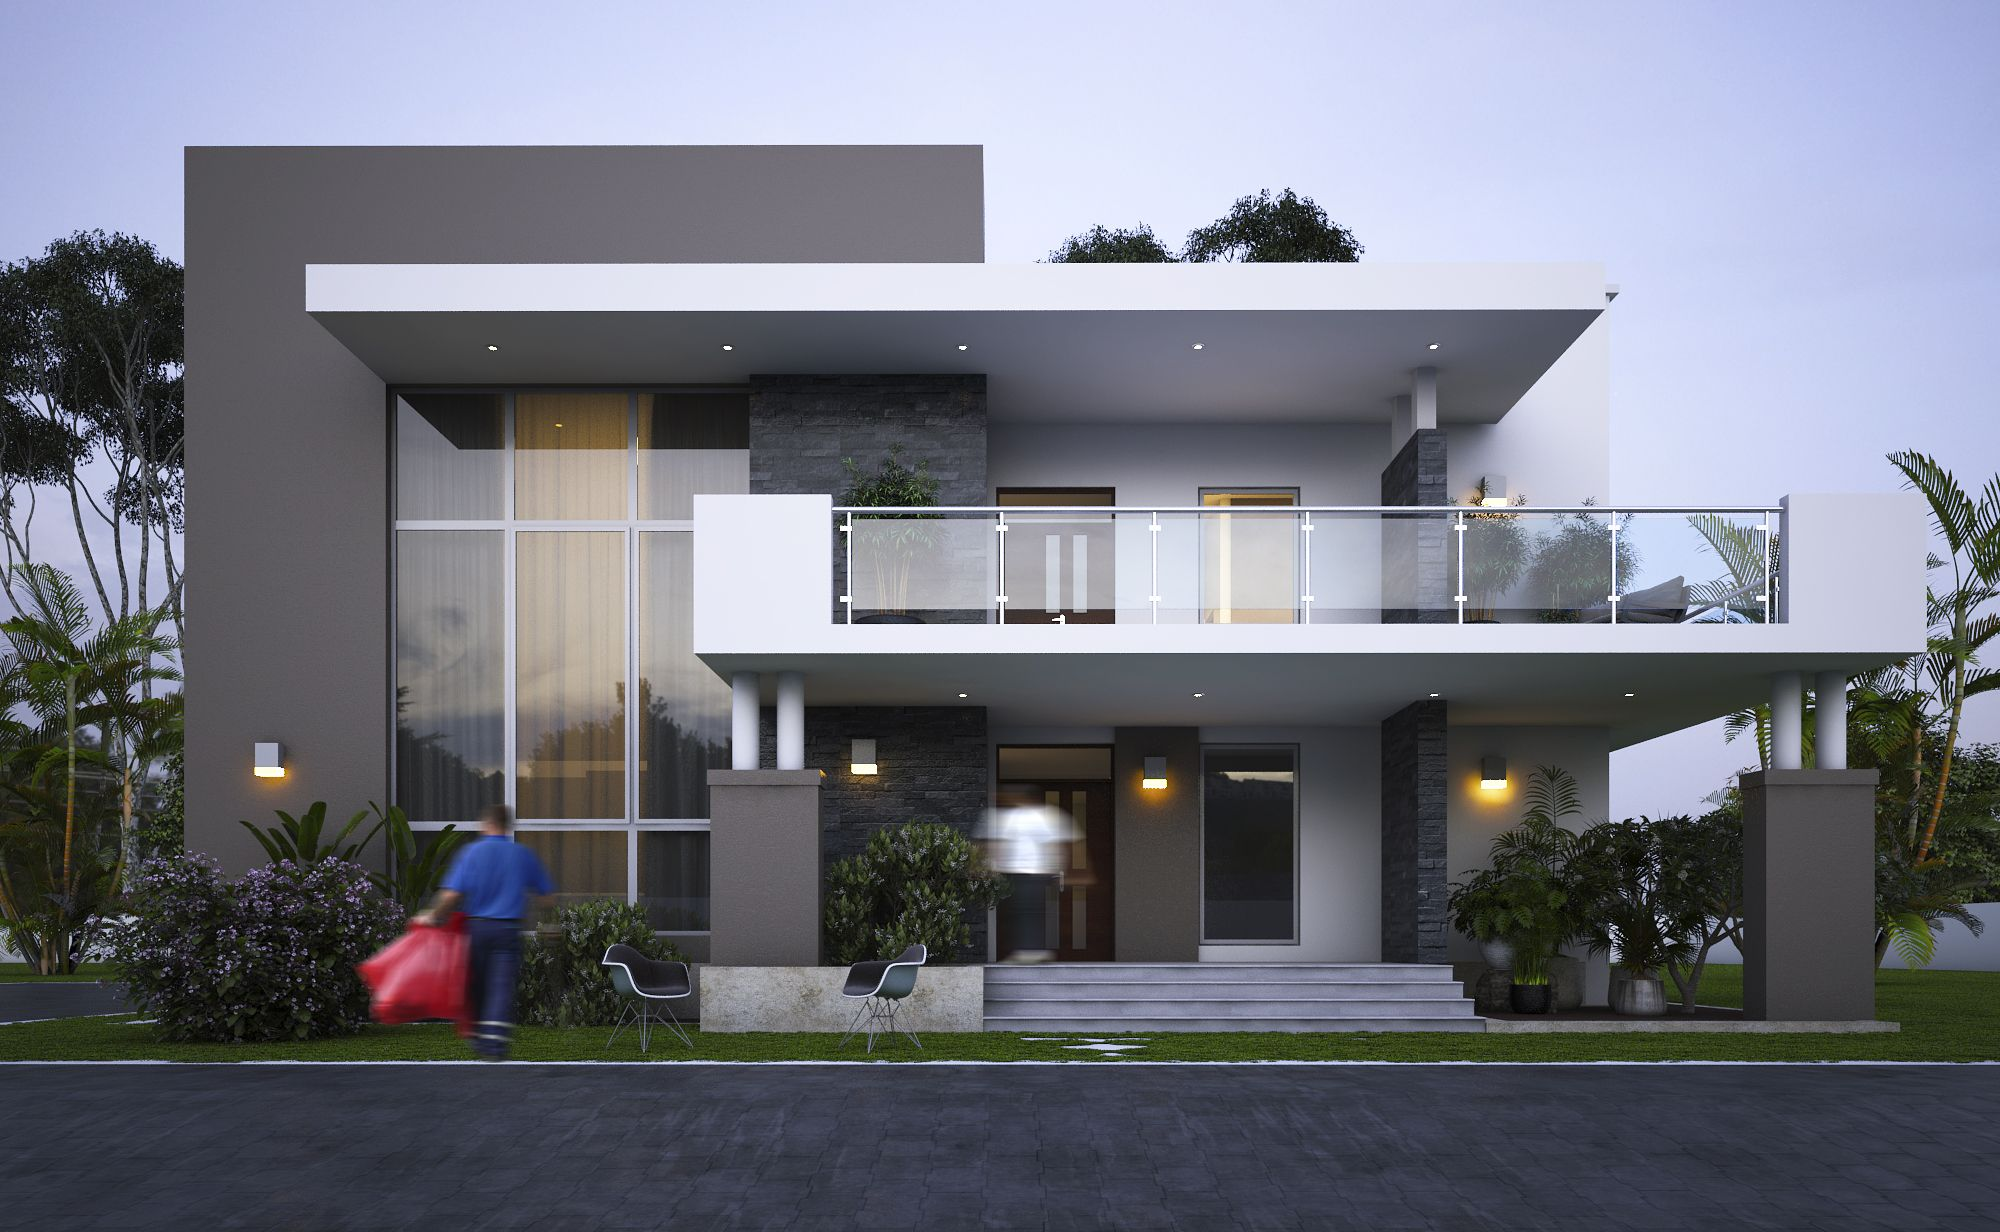 Home by egmdesigns cool house designs new modern design also designed egmvisuals inspiration arquitetura architecture rh pinterest